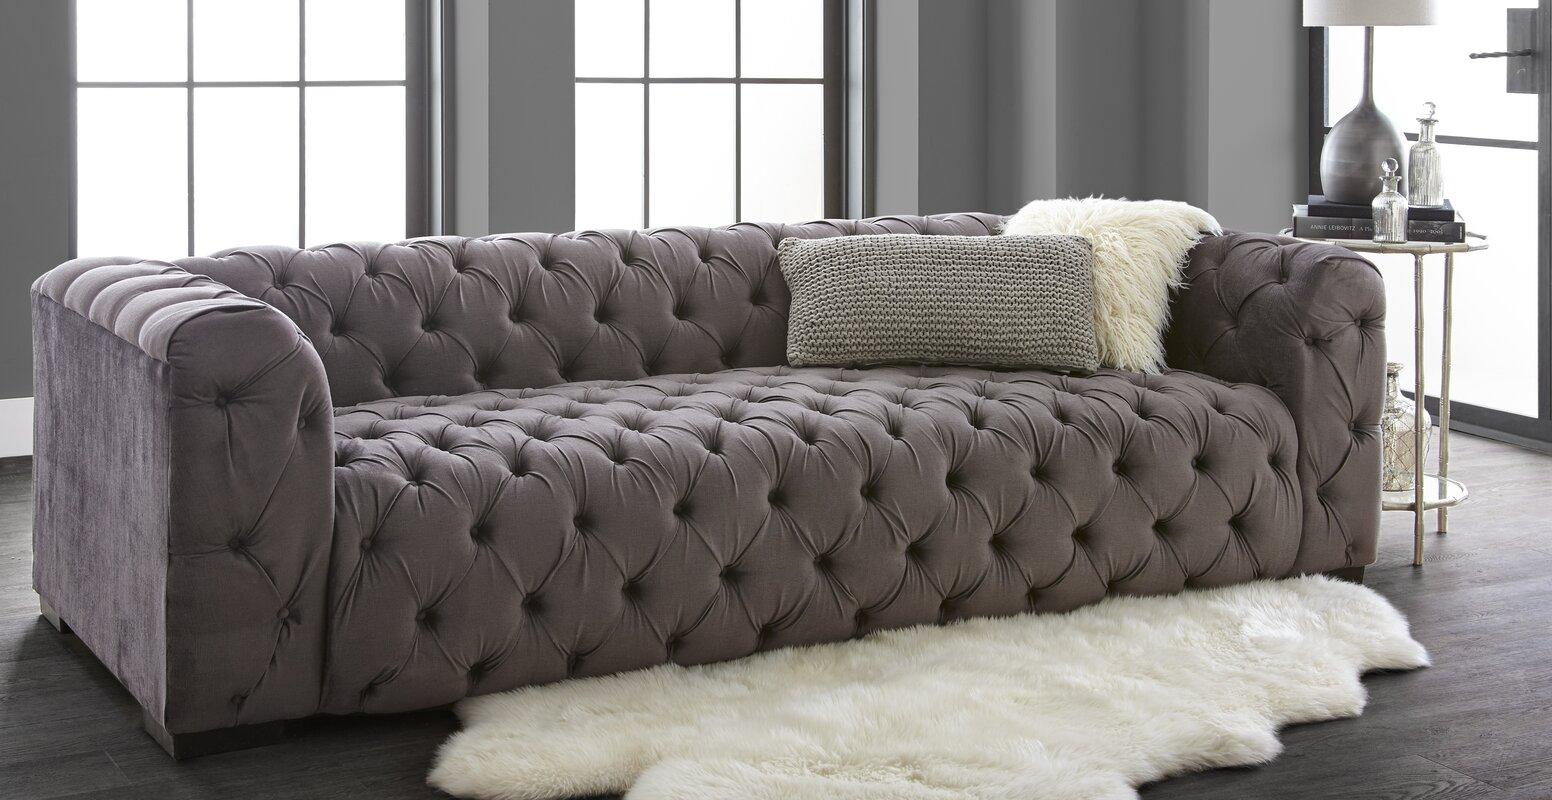 Chesterfield Sofas kensington chesterfield sofa reviews joss